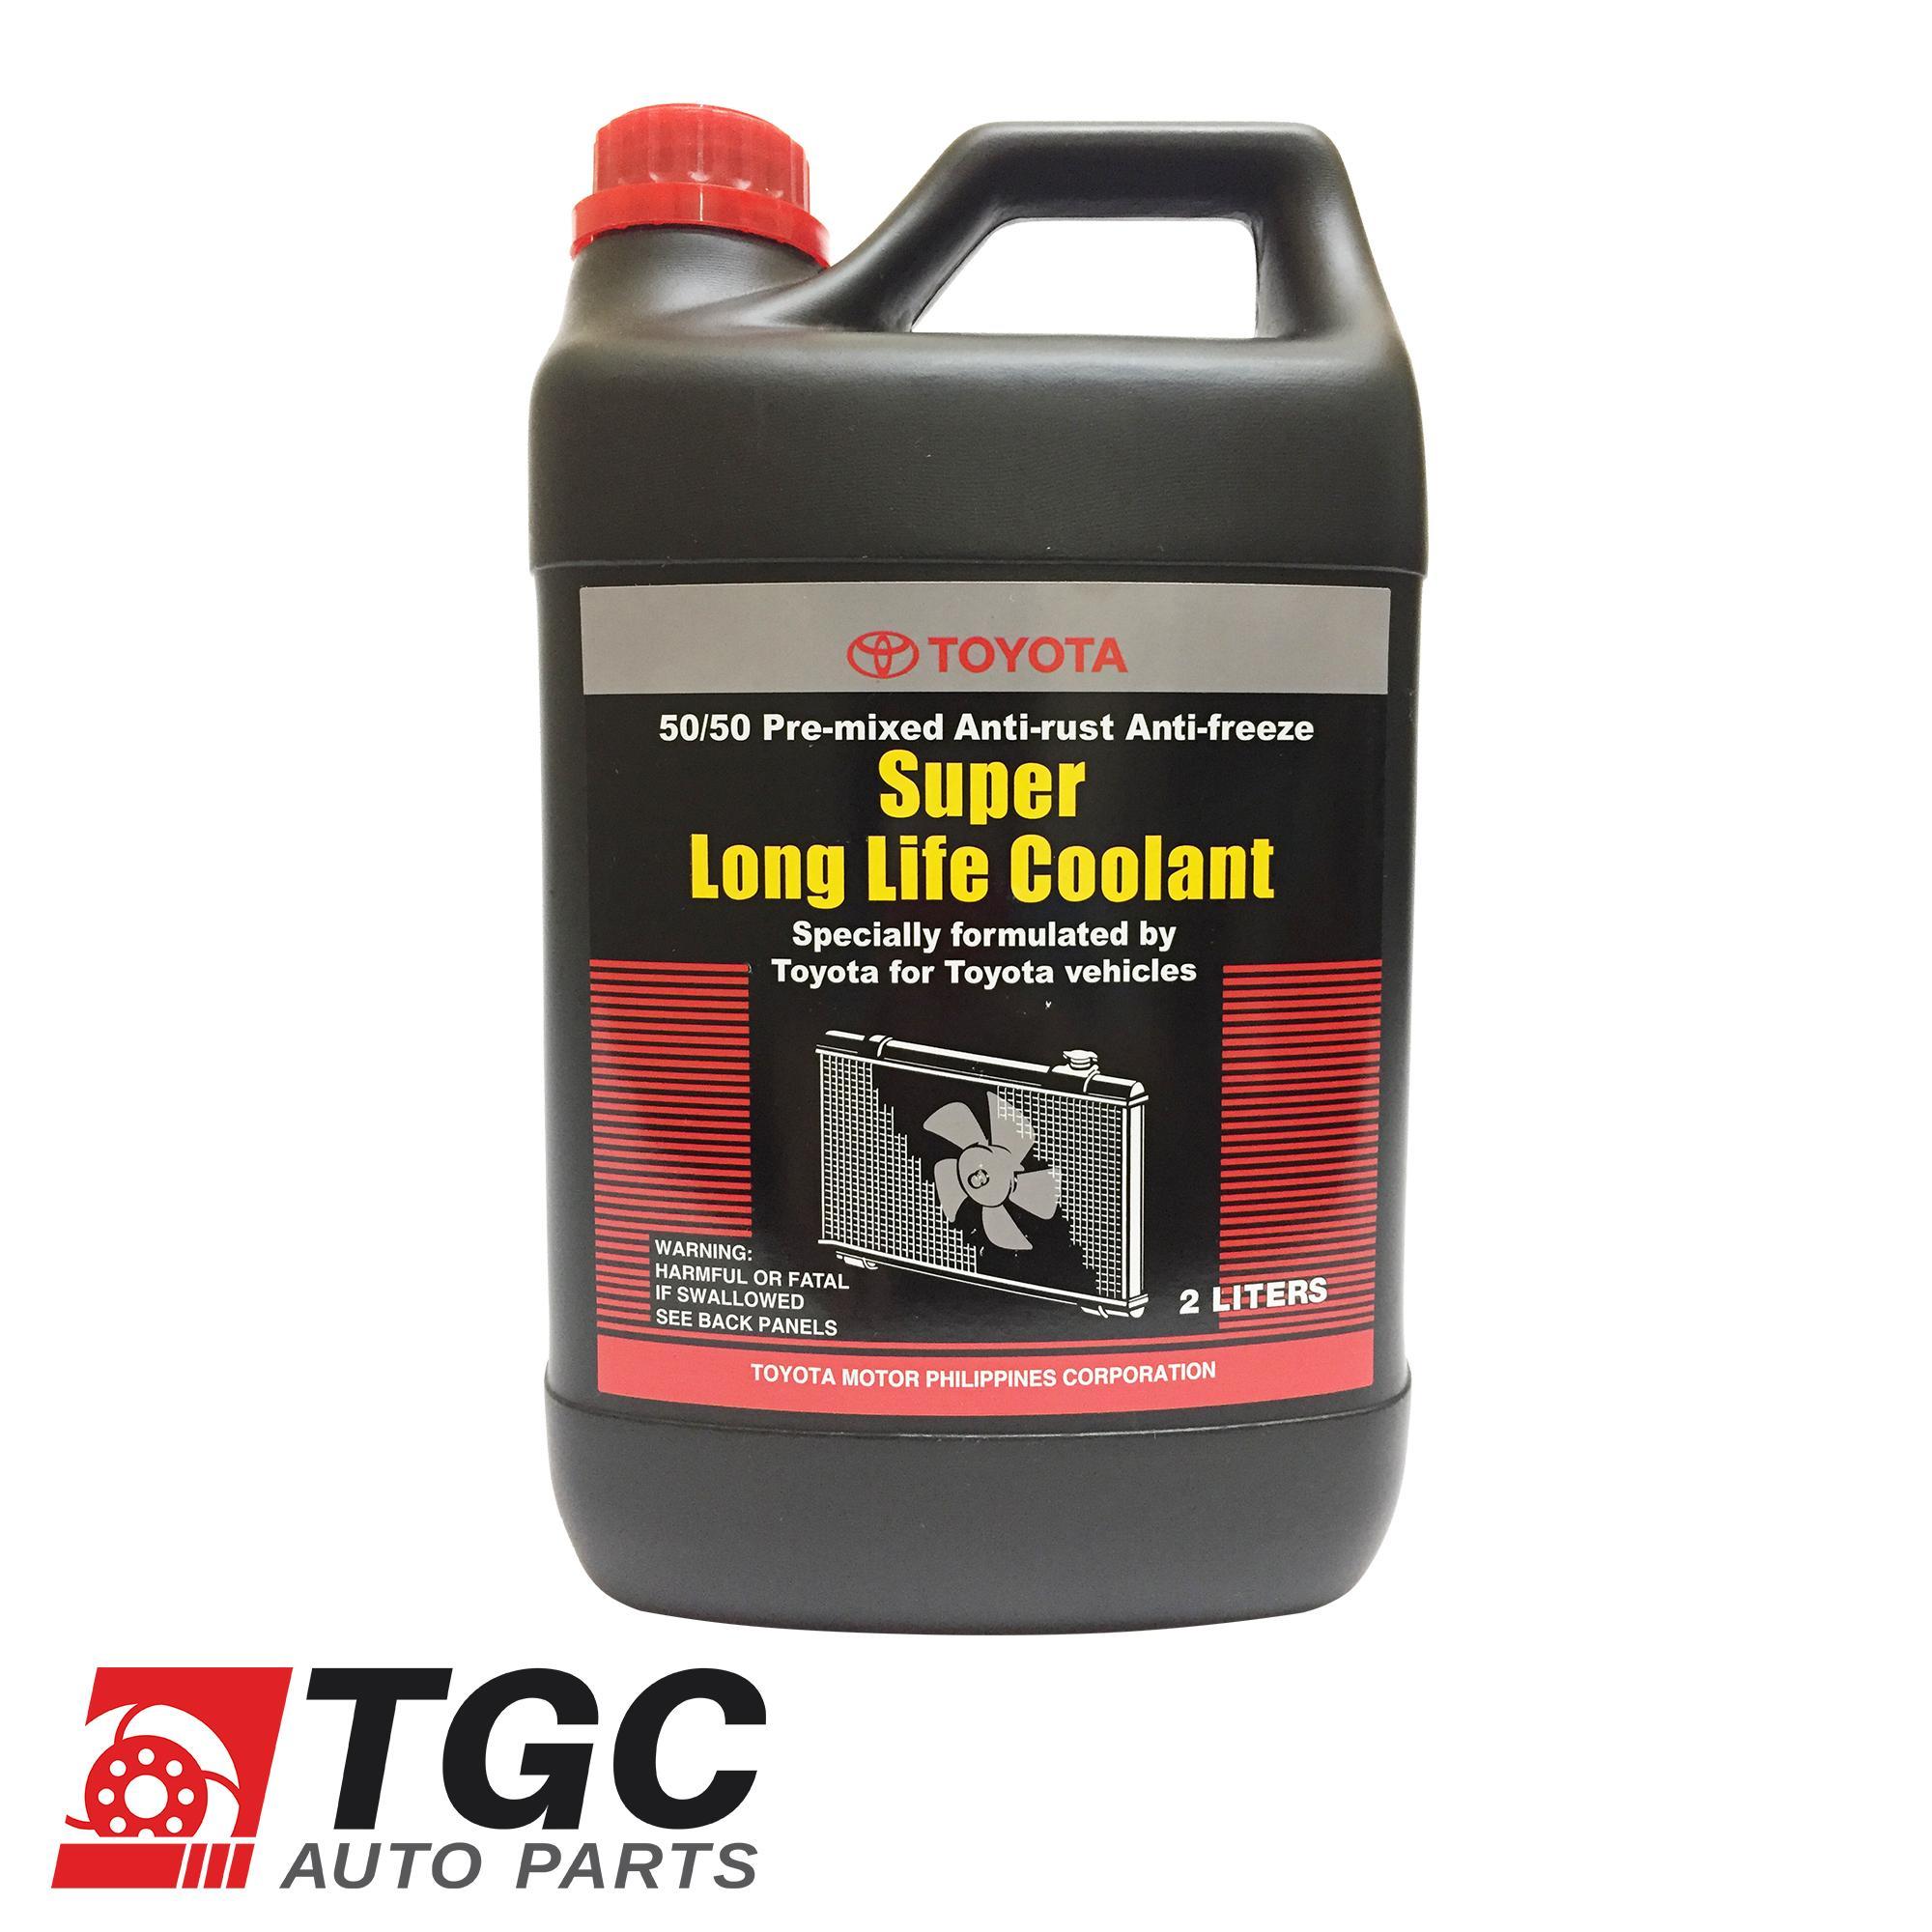 Toyota Super Long Life Coolant 50/50 Pre Mixed Anti Rust Anti